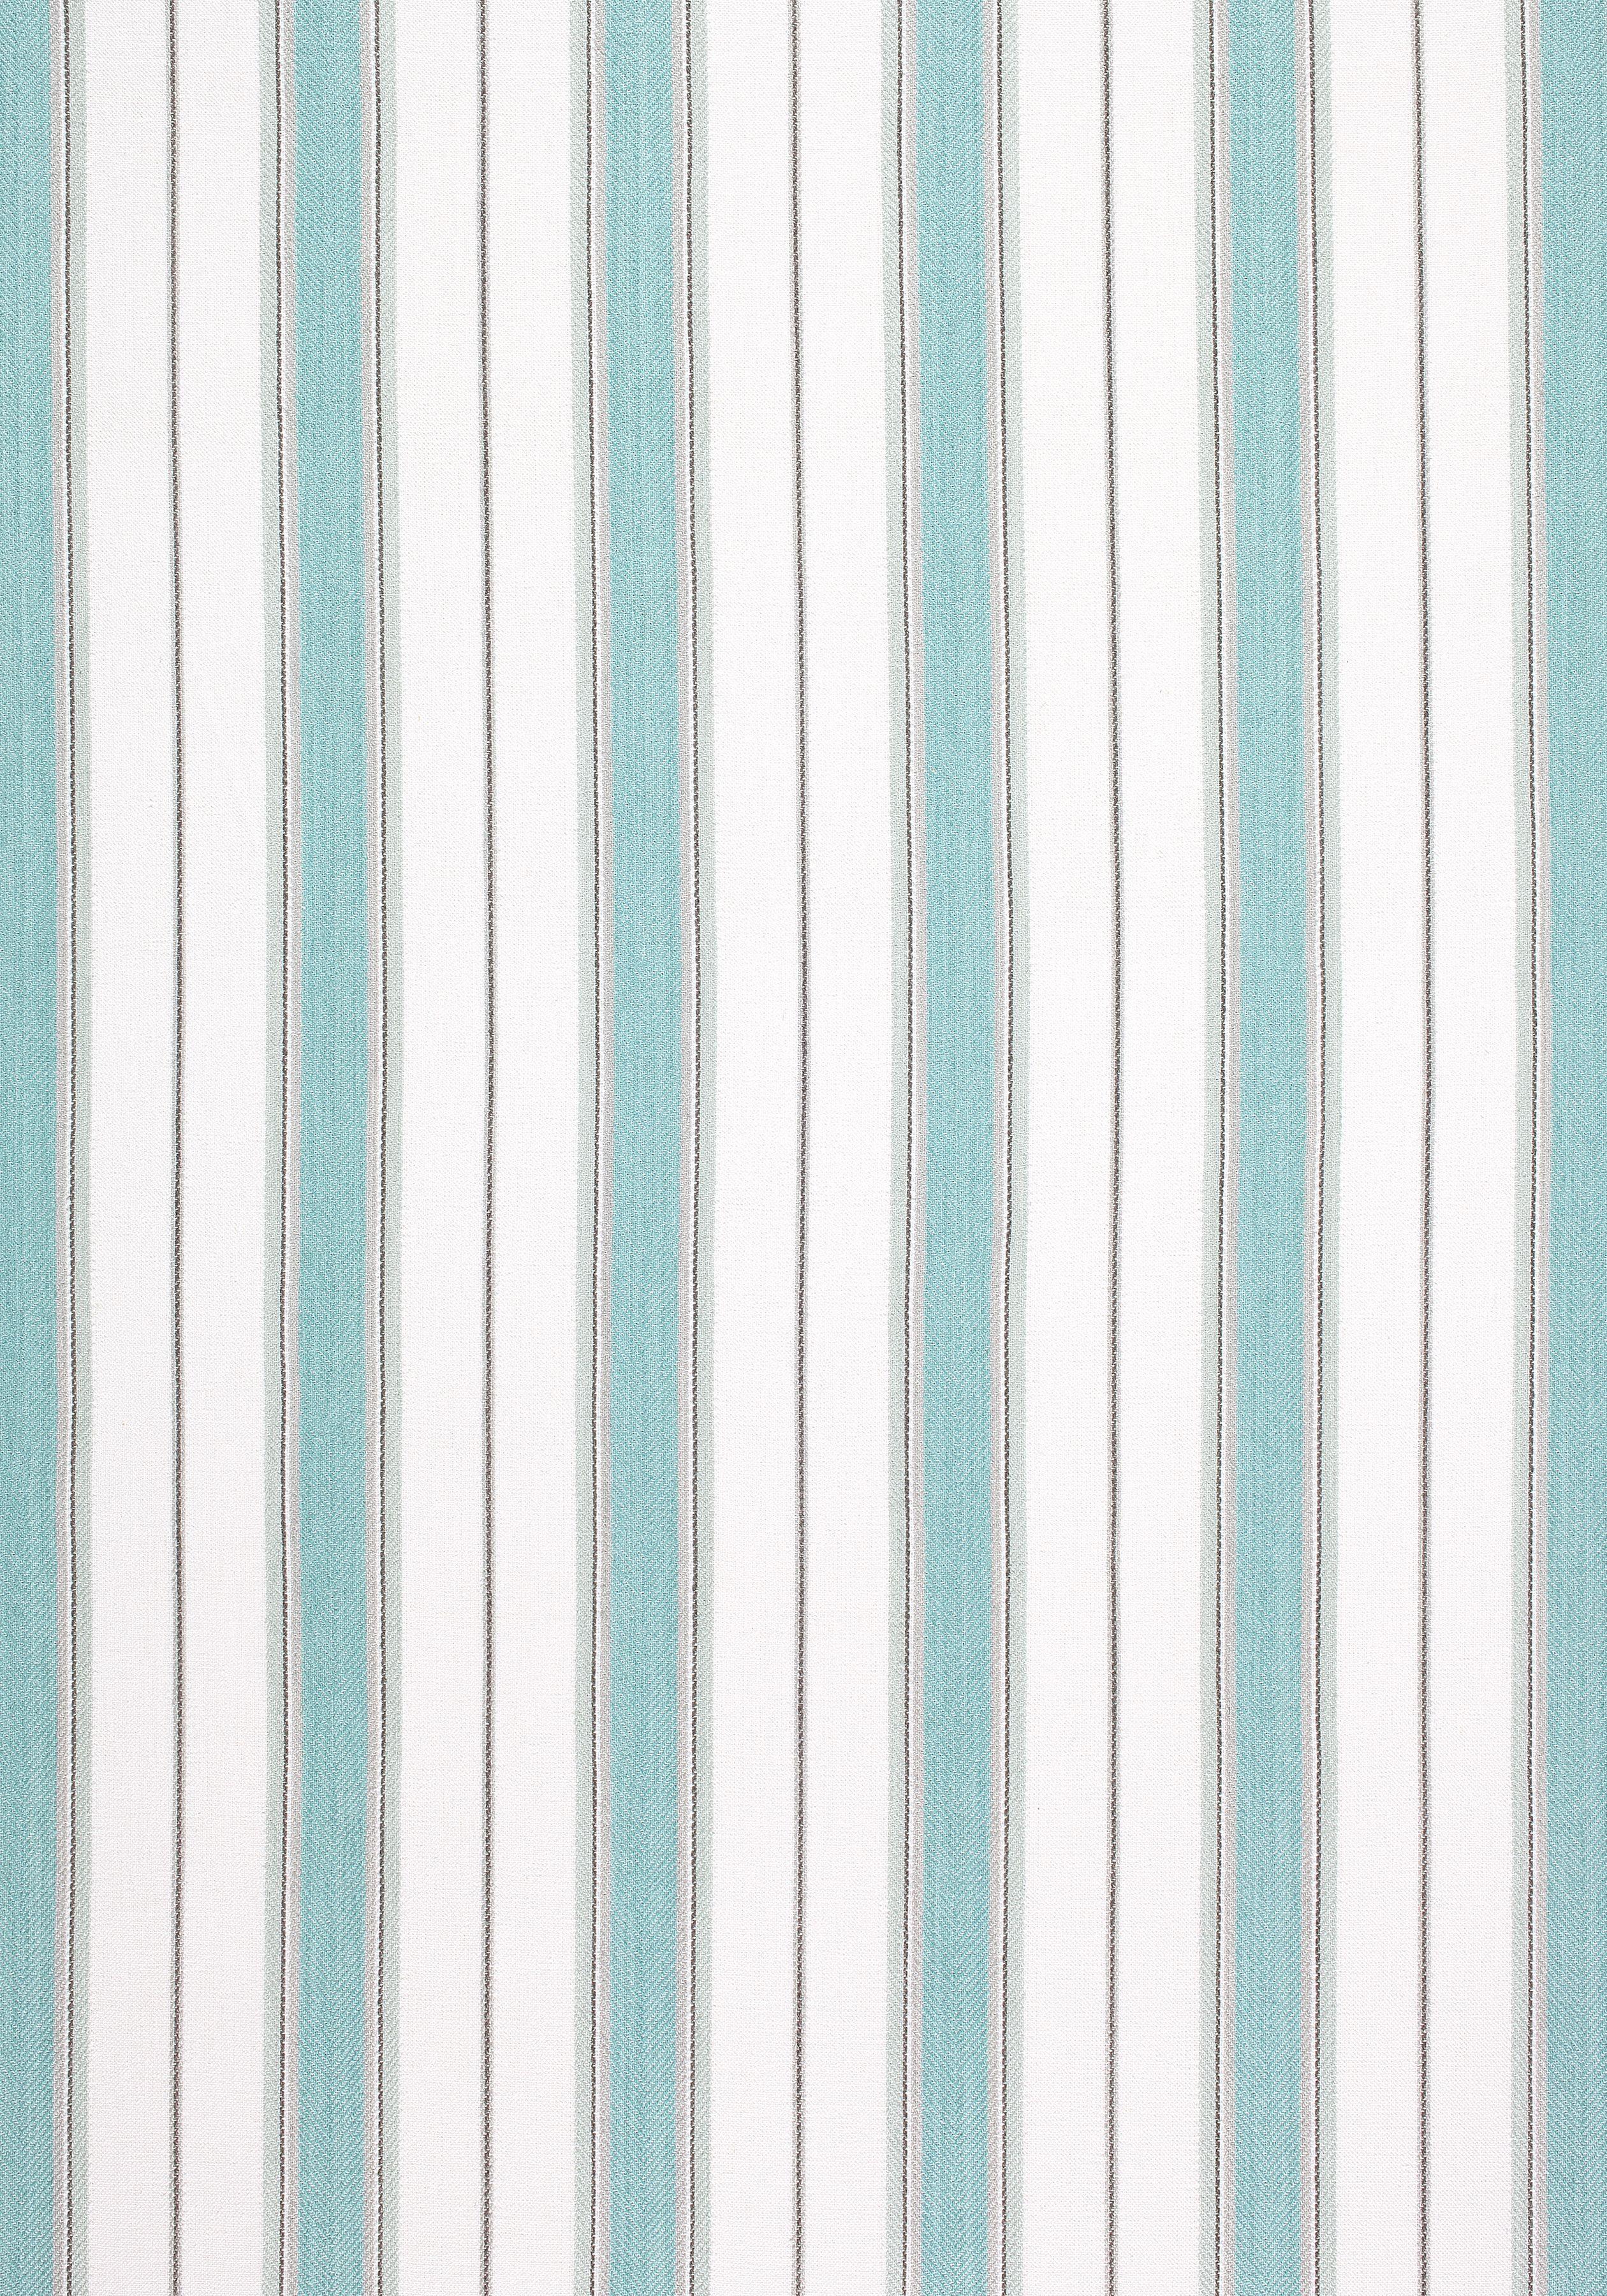 STONINGTON STRIPE, Aqua, W80107, Collection Woven 9